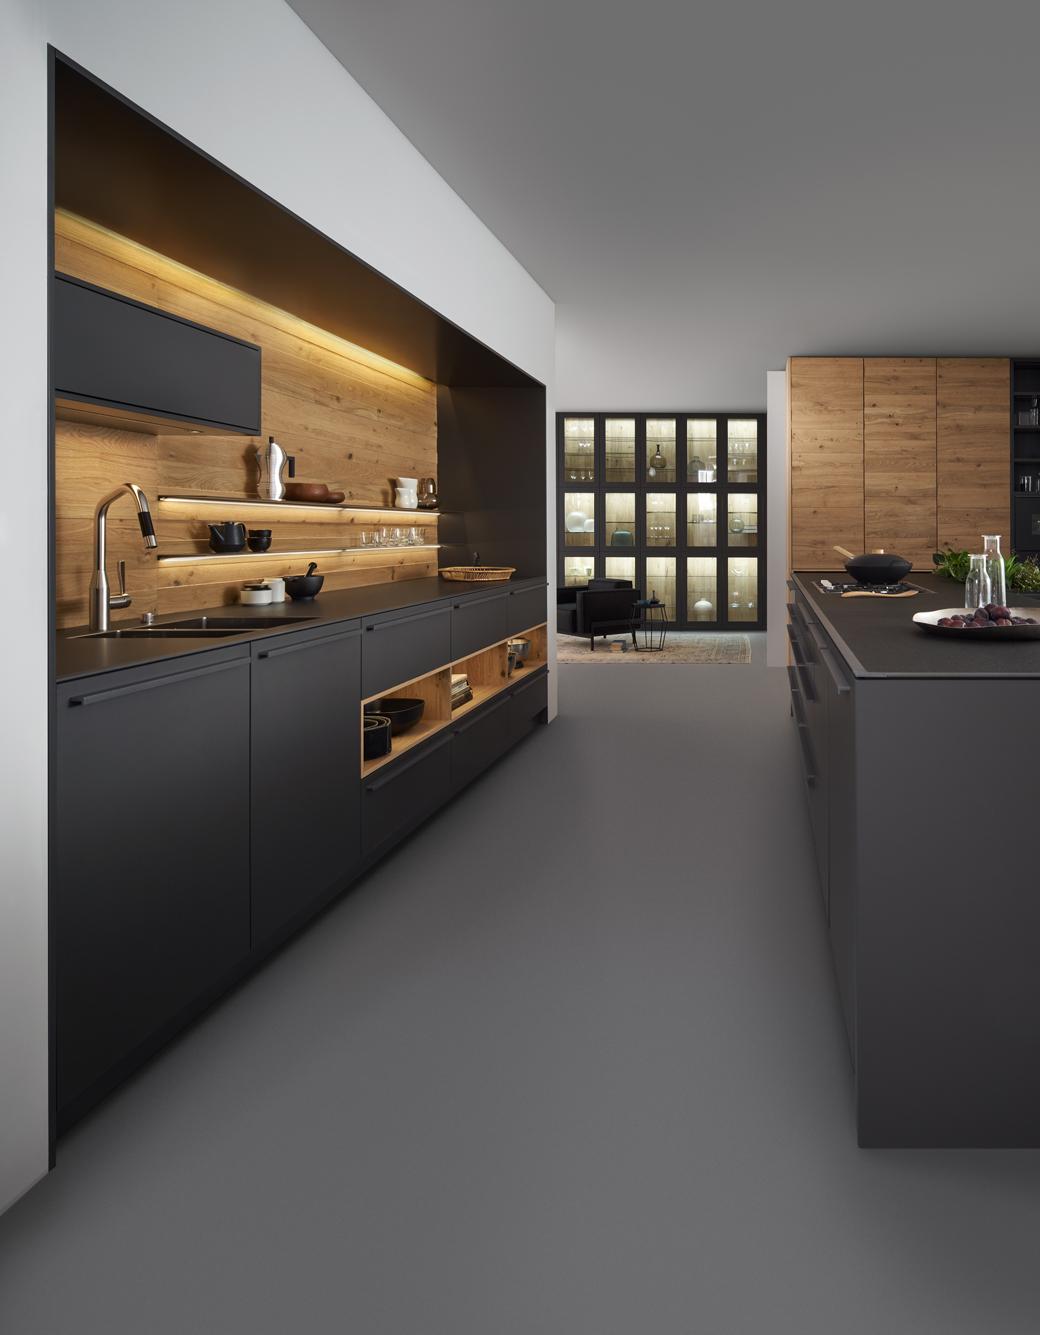 Black Kitchens Los Angeles County, CA